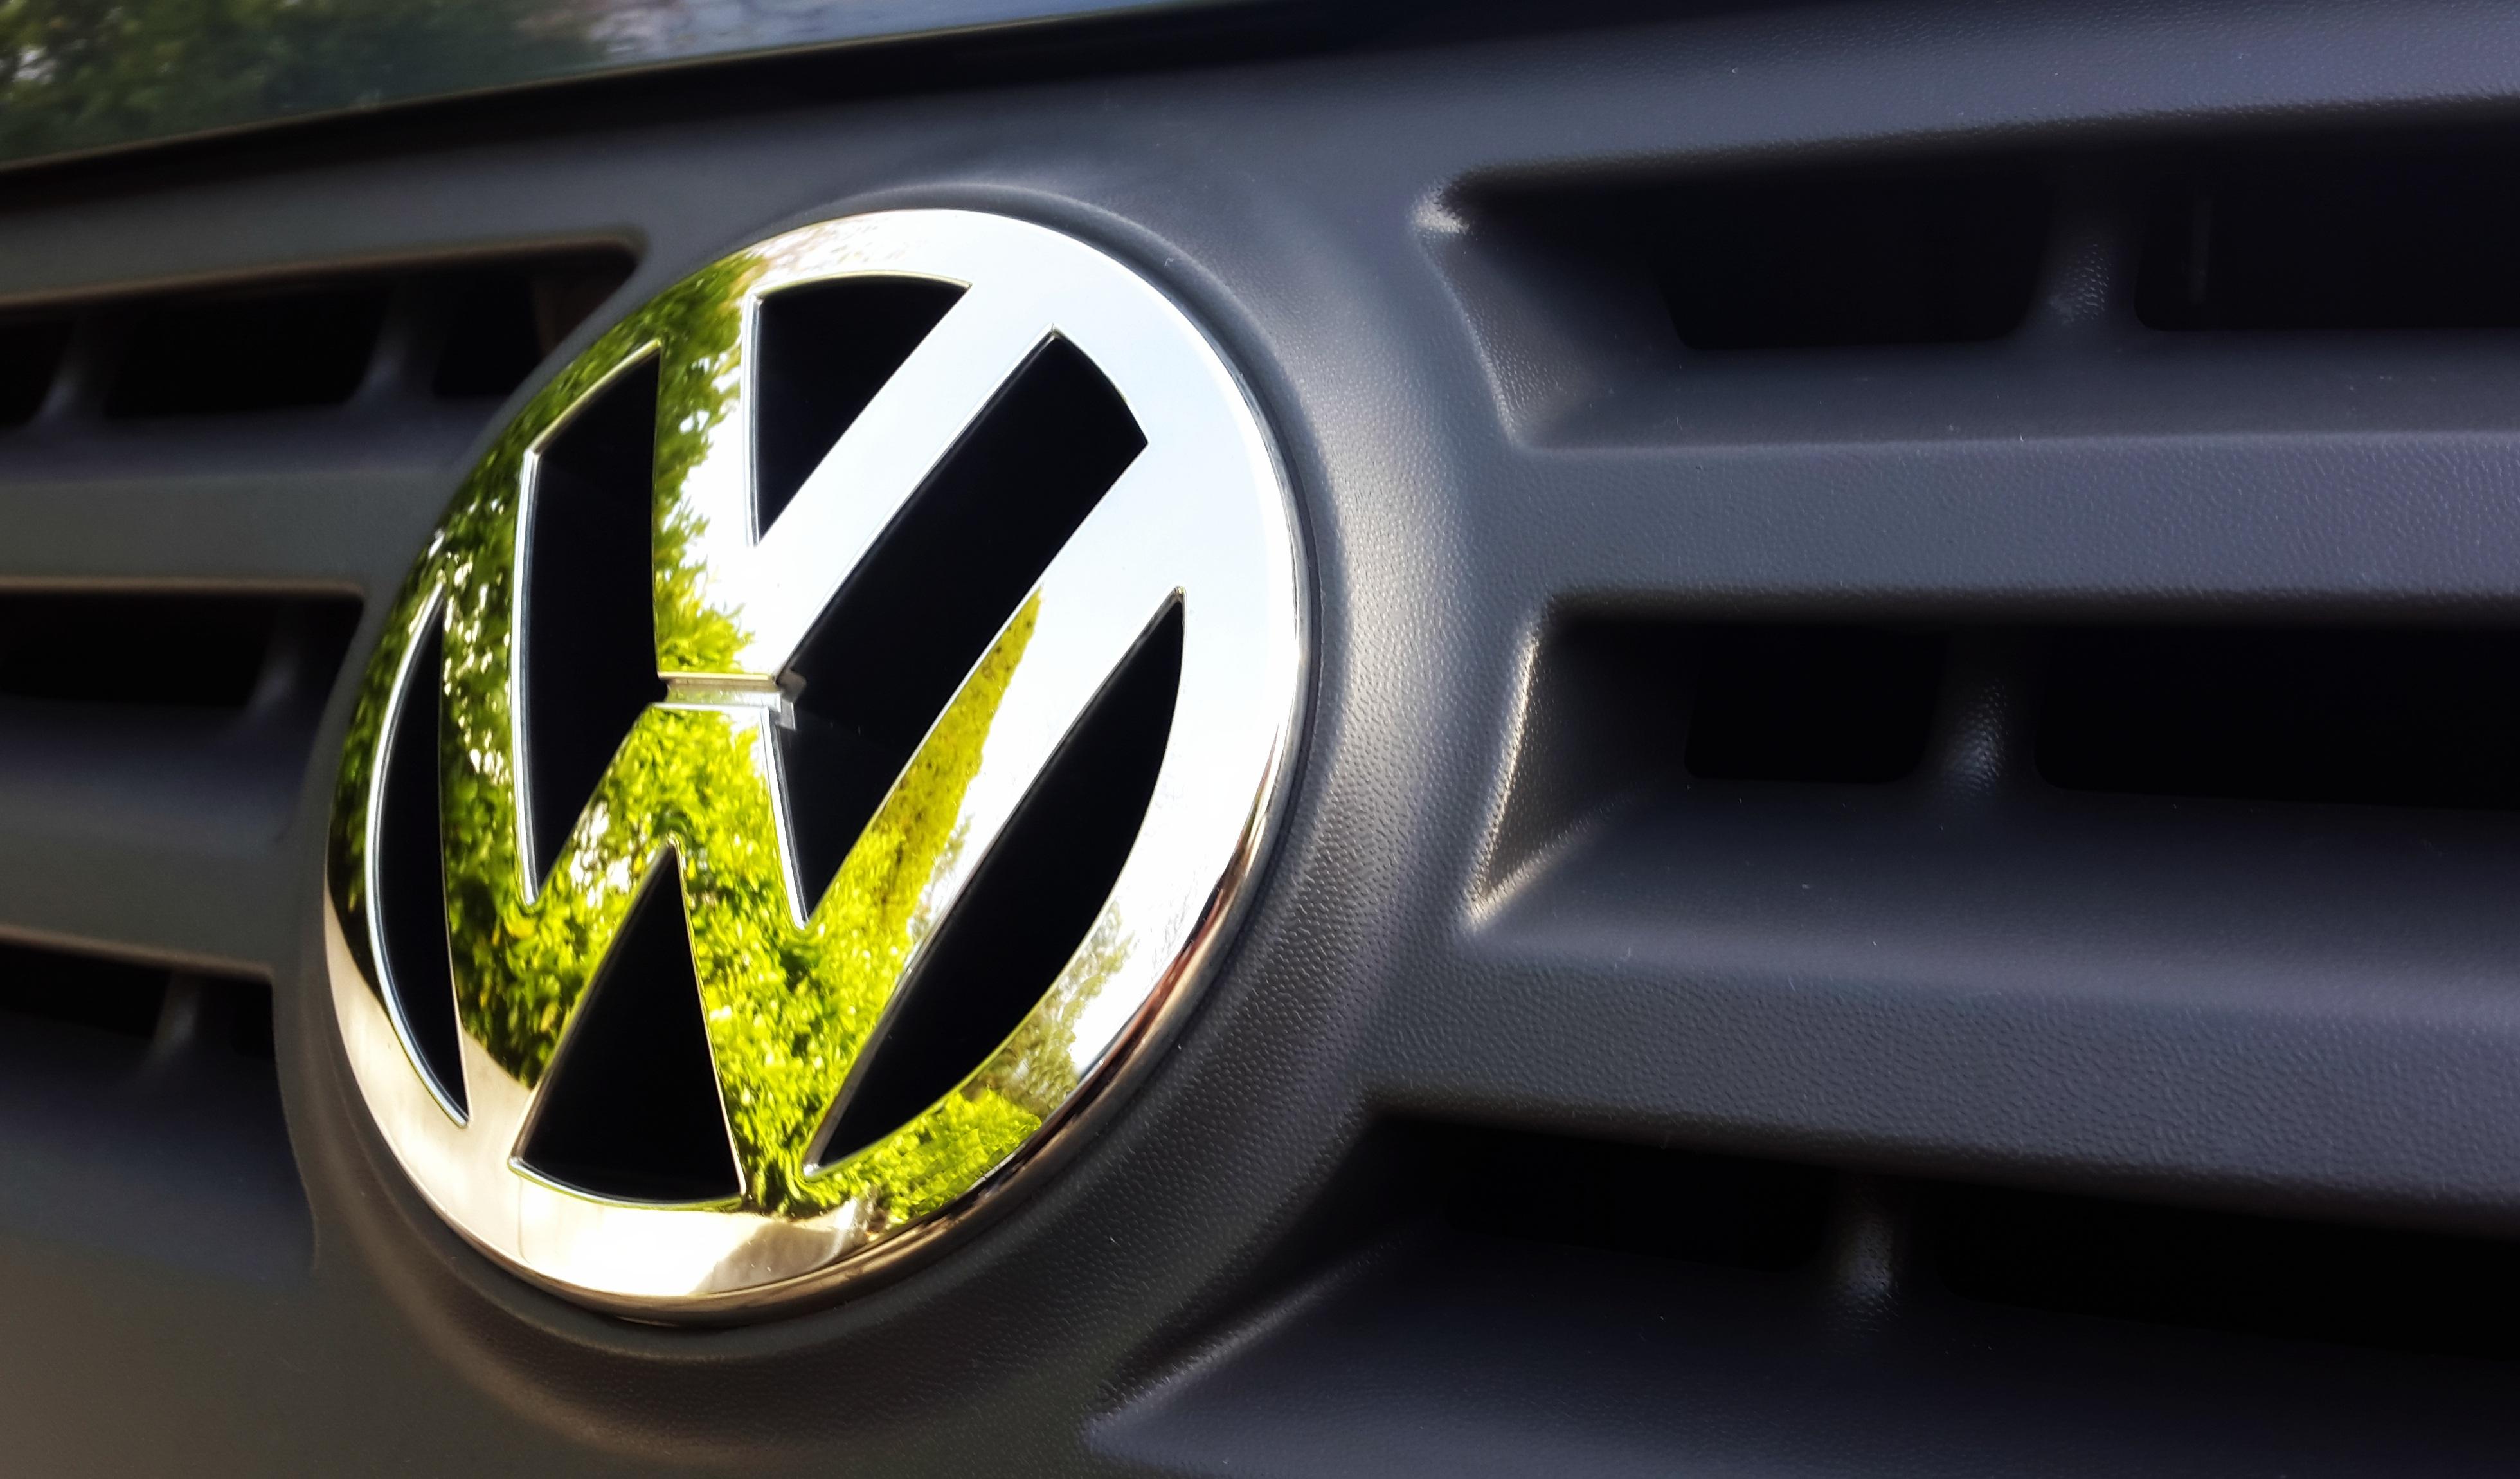 Free Images Vw Volkswagen Auto Steering Wheel Grille Bumper